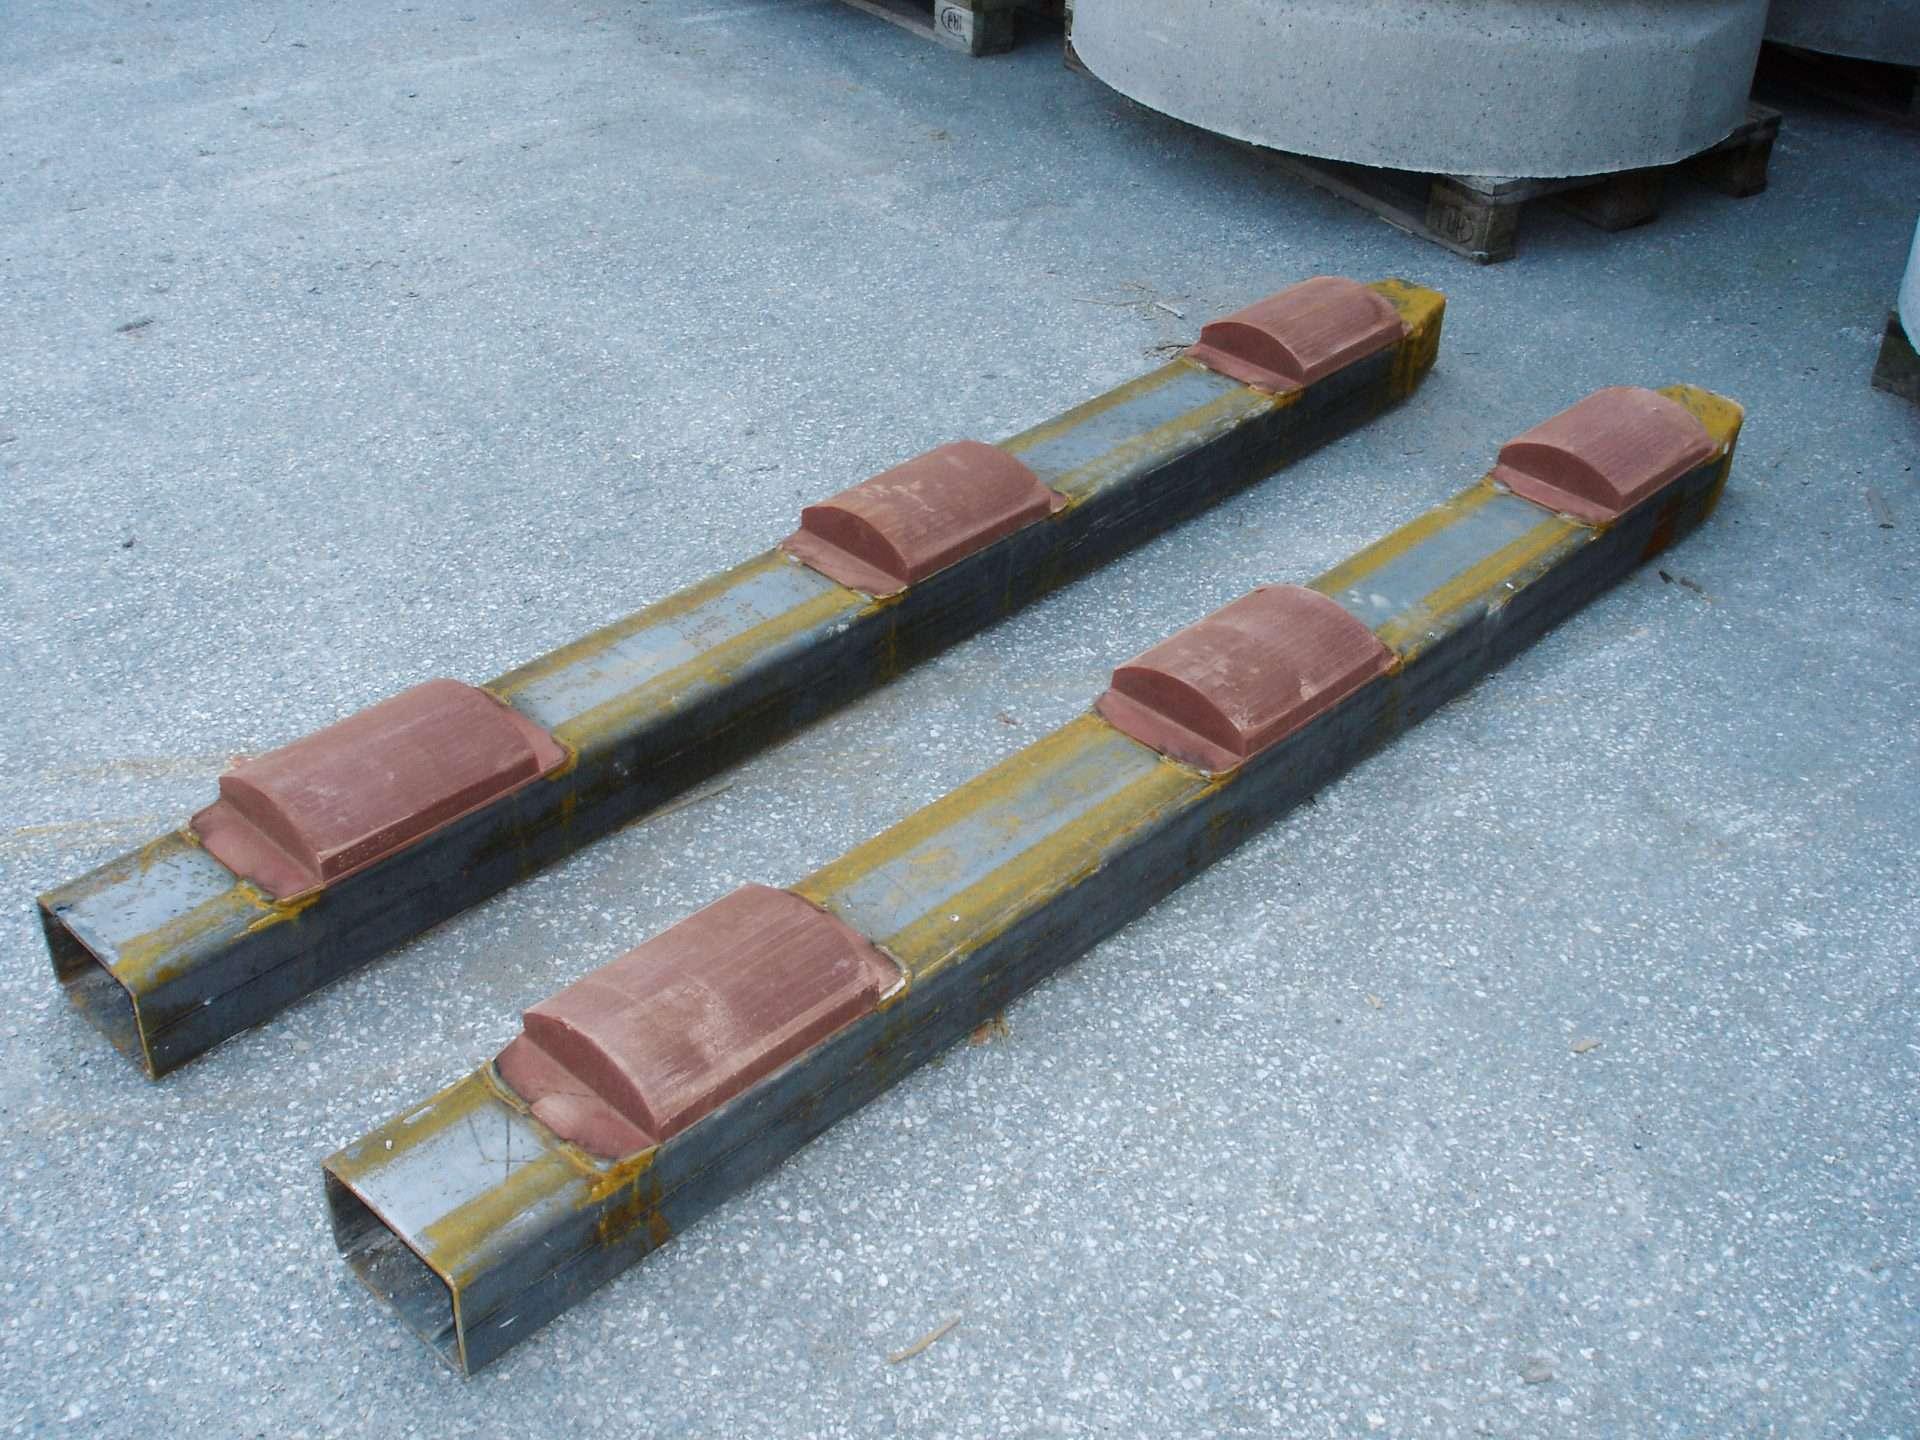 Betonrohrschutz für Gabelstaplerschuhe / Concrete pipe protection for forklift shoes